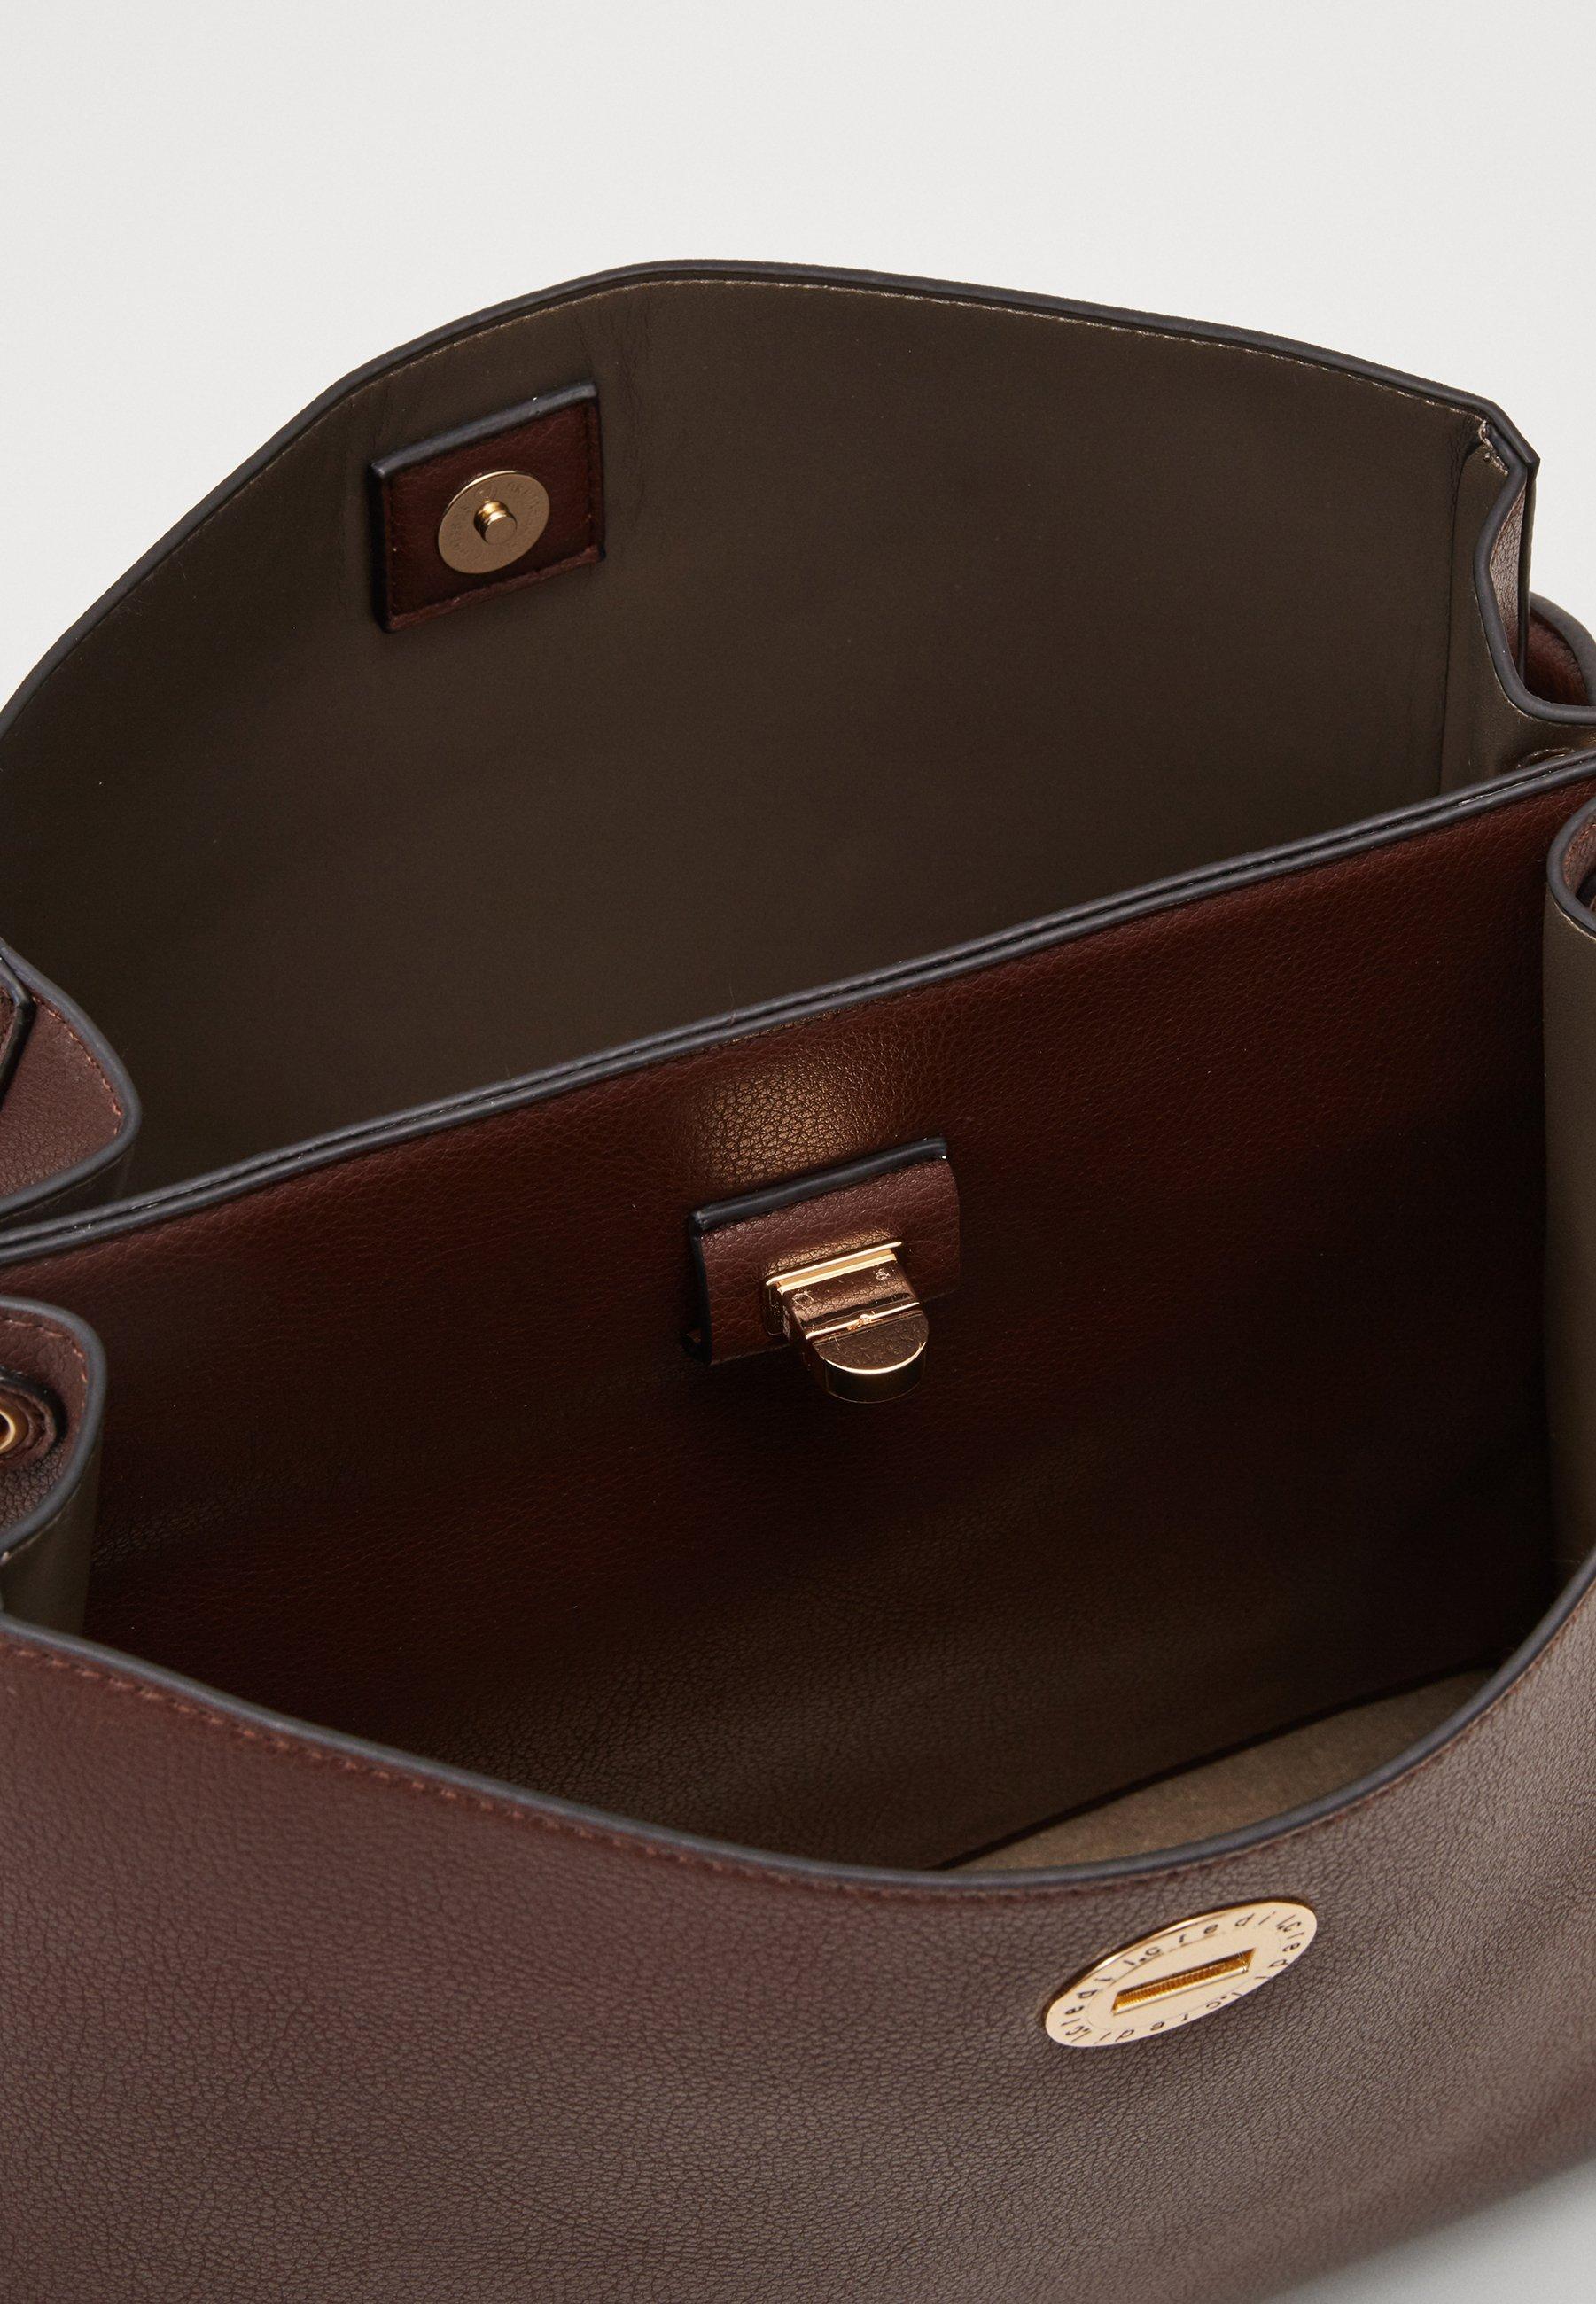 The Cheapest For Cheap Accessories L.Credi FILIPPA Handbag braun 5nkKNoMDl lCELP8RQG